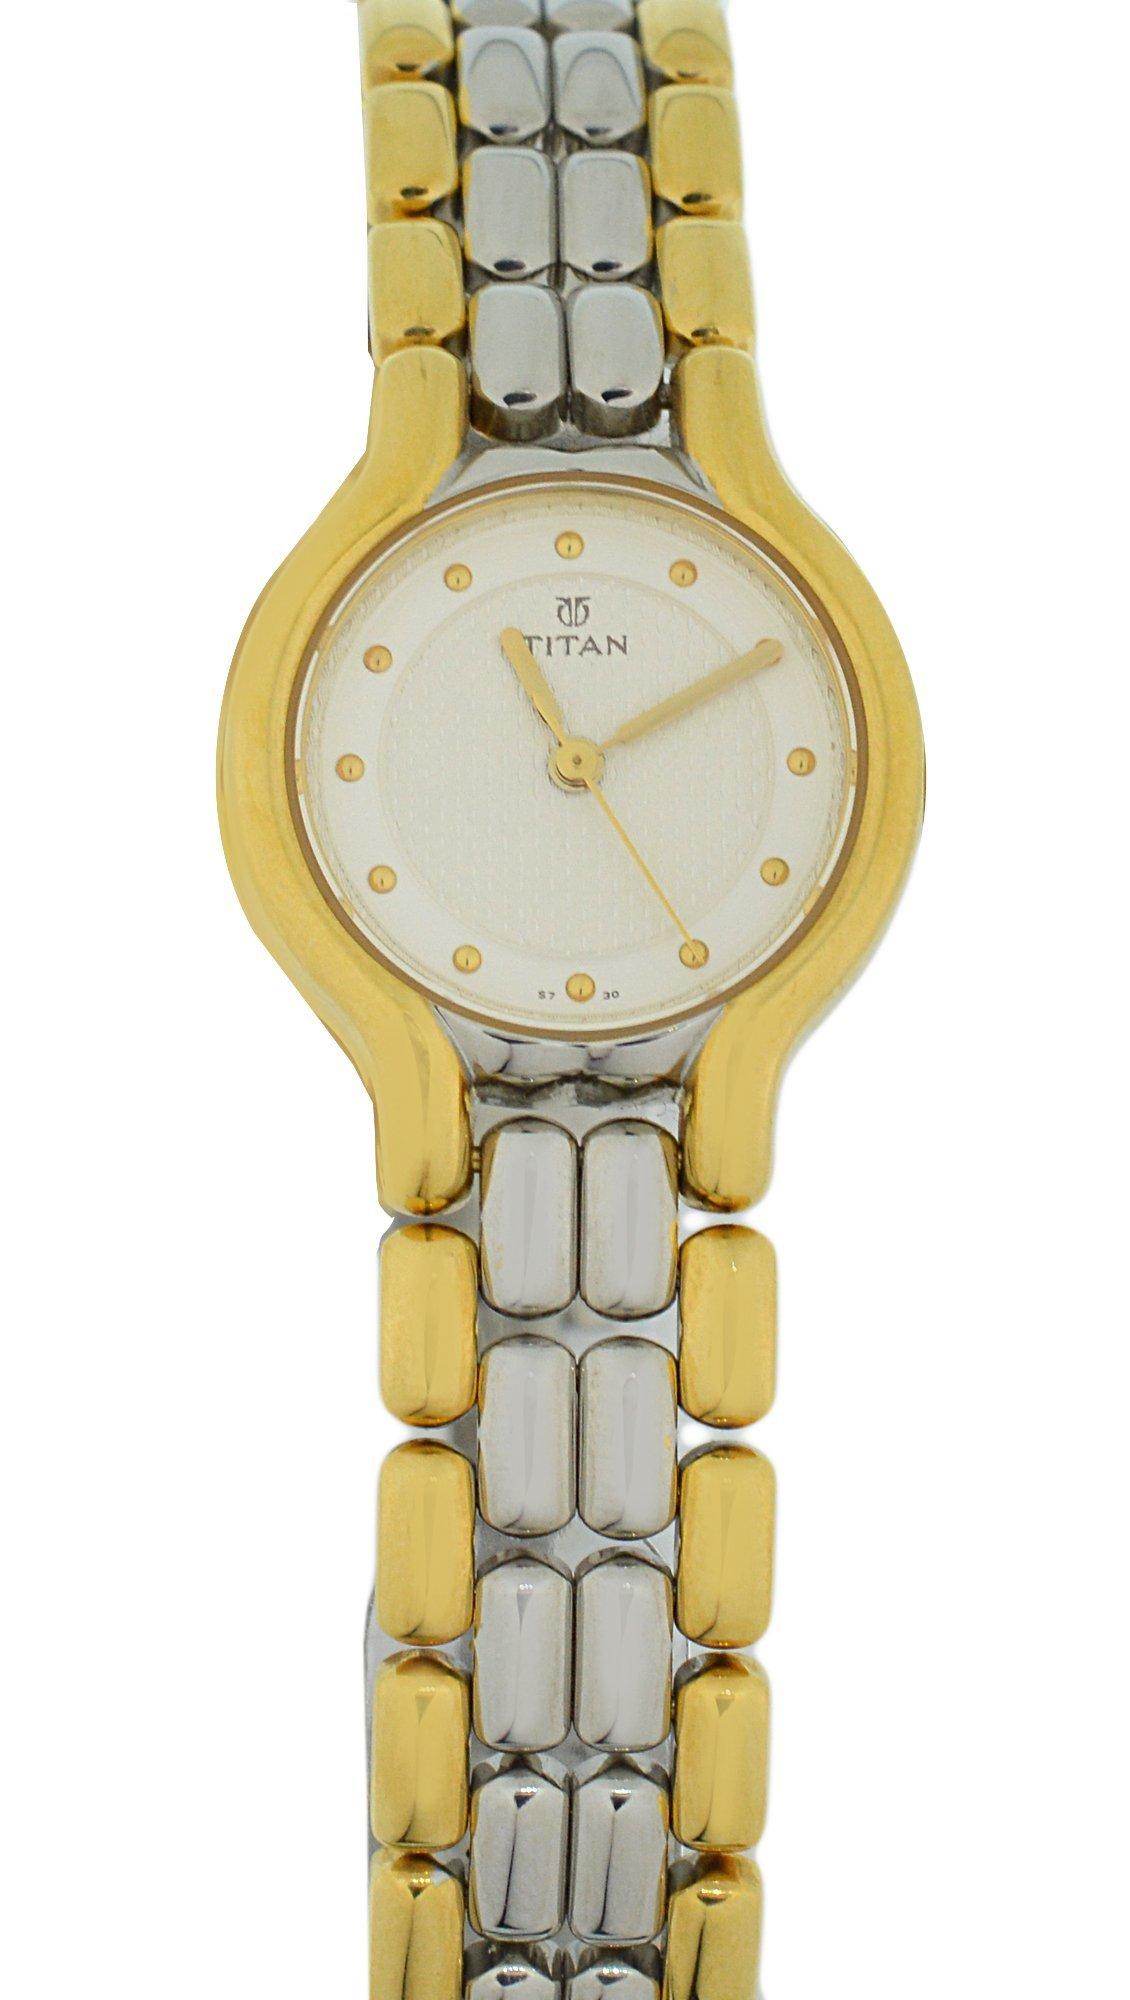 Mertzios.gr Γυναικείο ρολόι TITAN με ασημί-χρυσό μπρασελέ και λευκό καντράν 7fdd27bd796